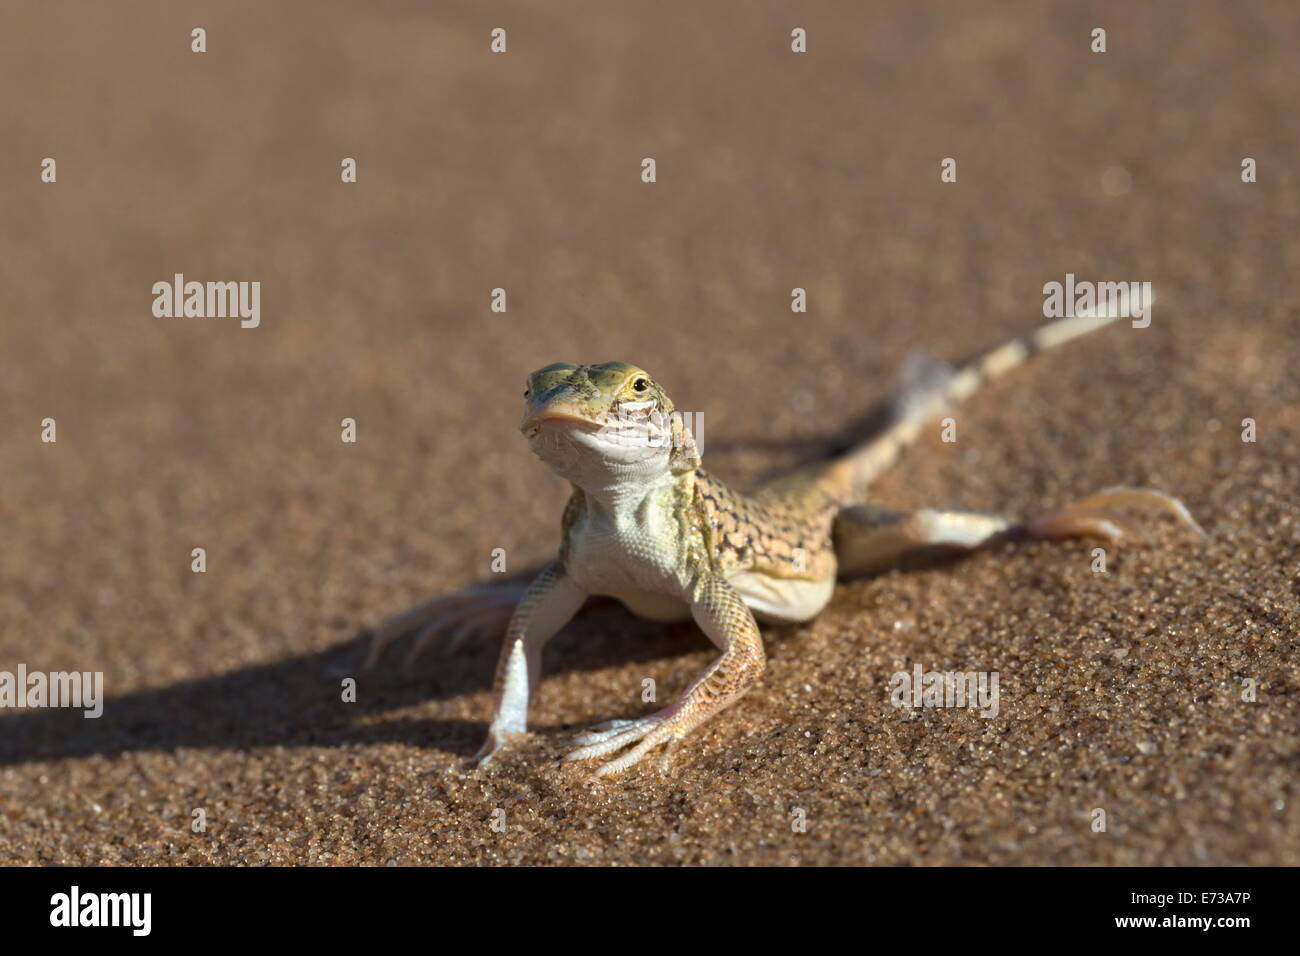 Shovel-snouted lizard (Meroles anchietae), Namib Desert, Namibia, Africa - Stock Image